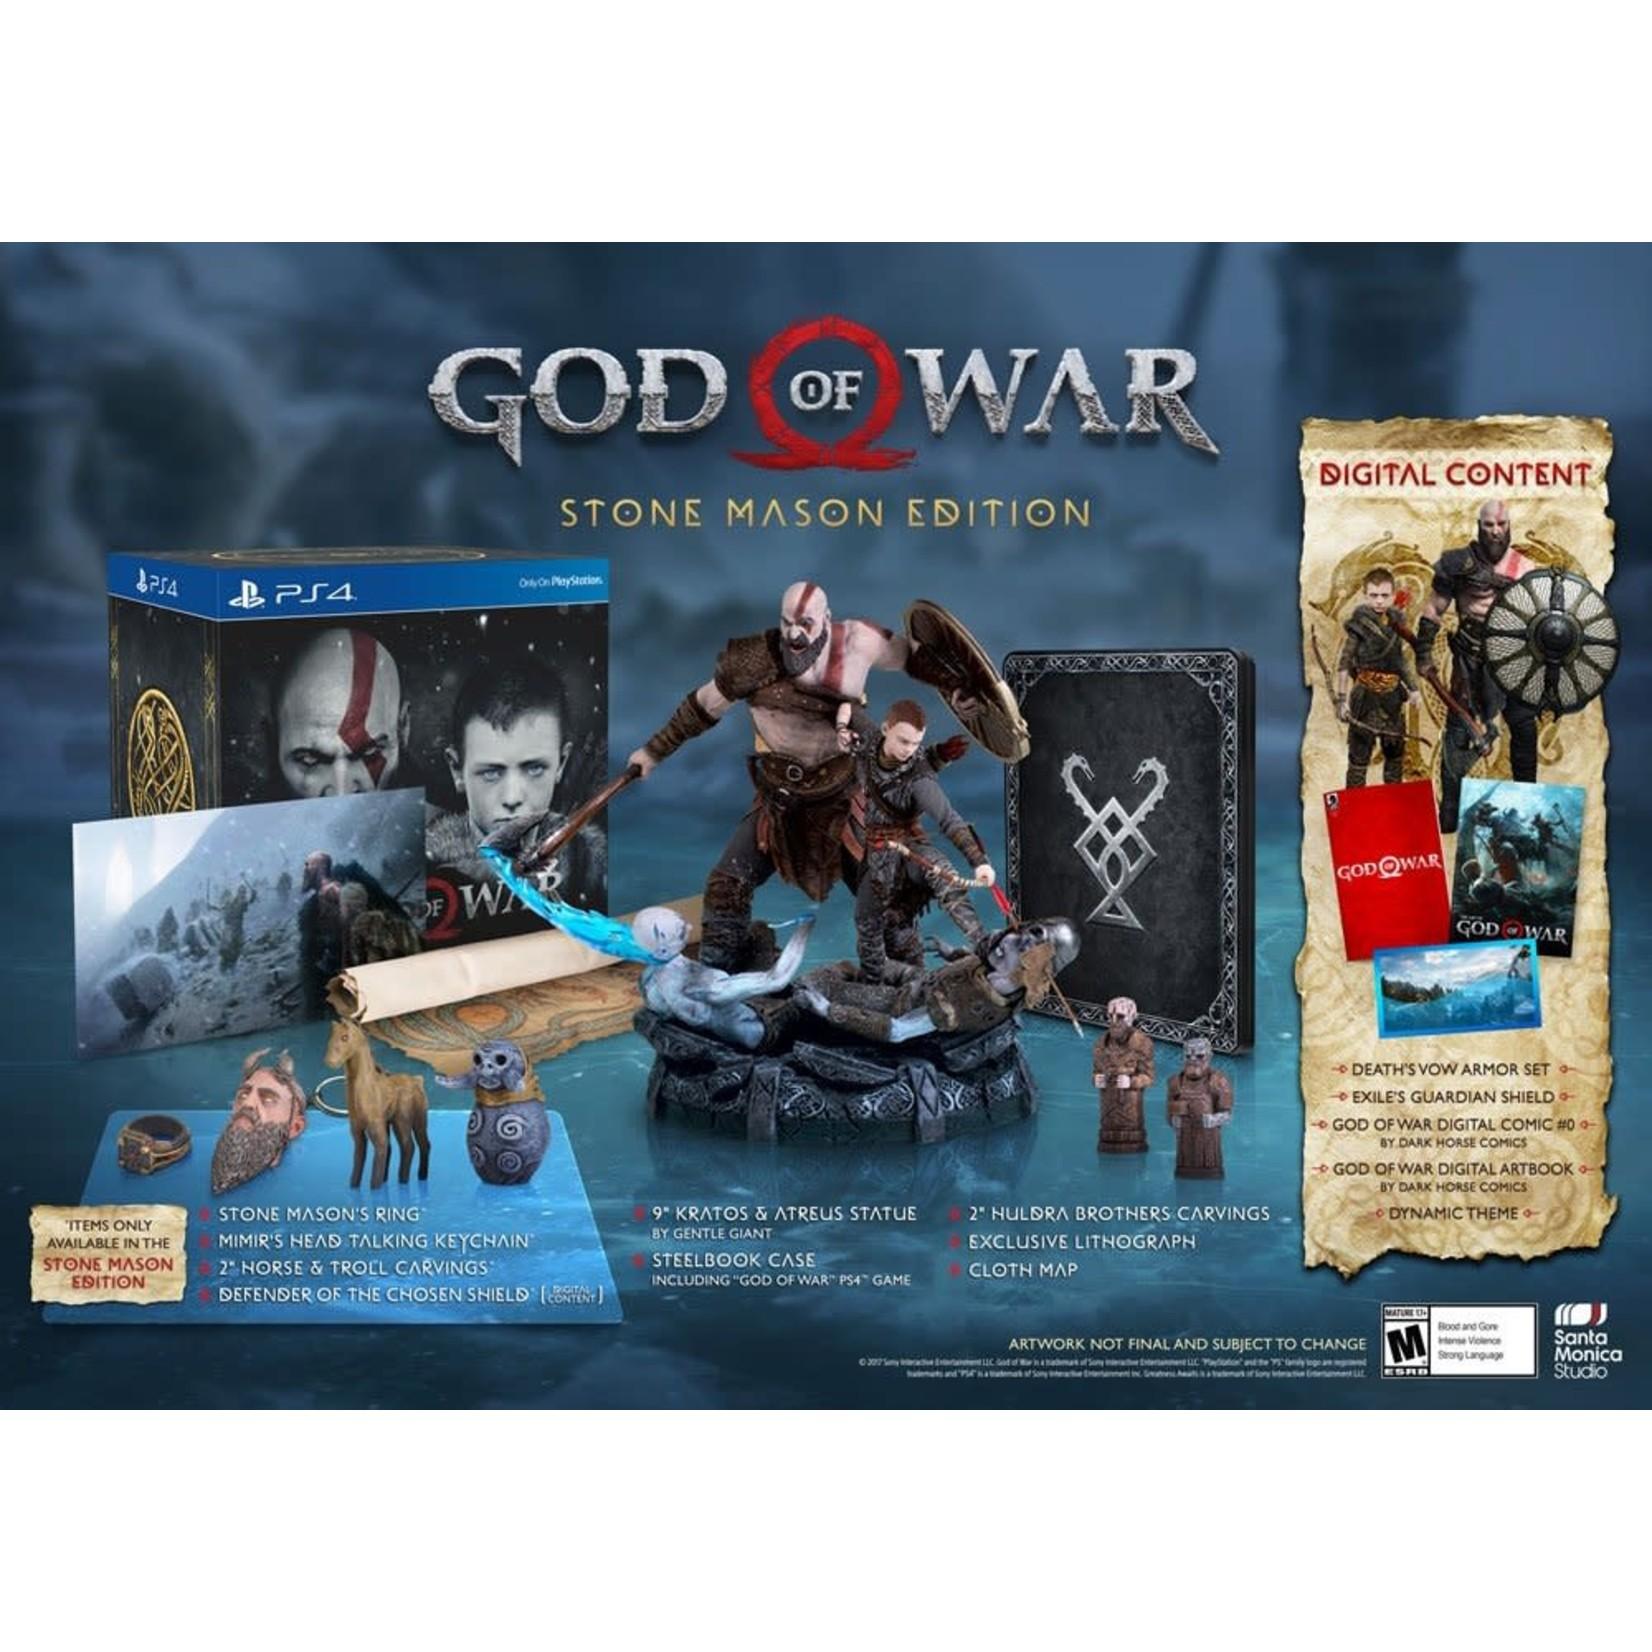 PS4-God of War Stone Mason Edition